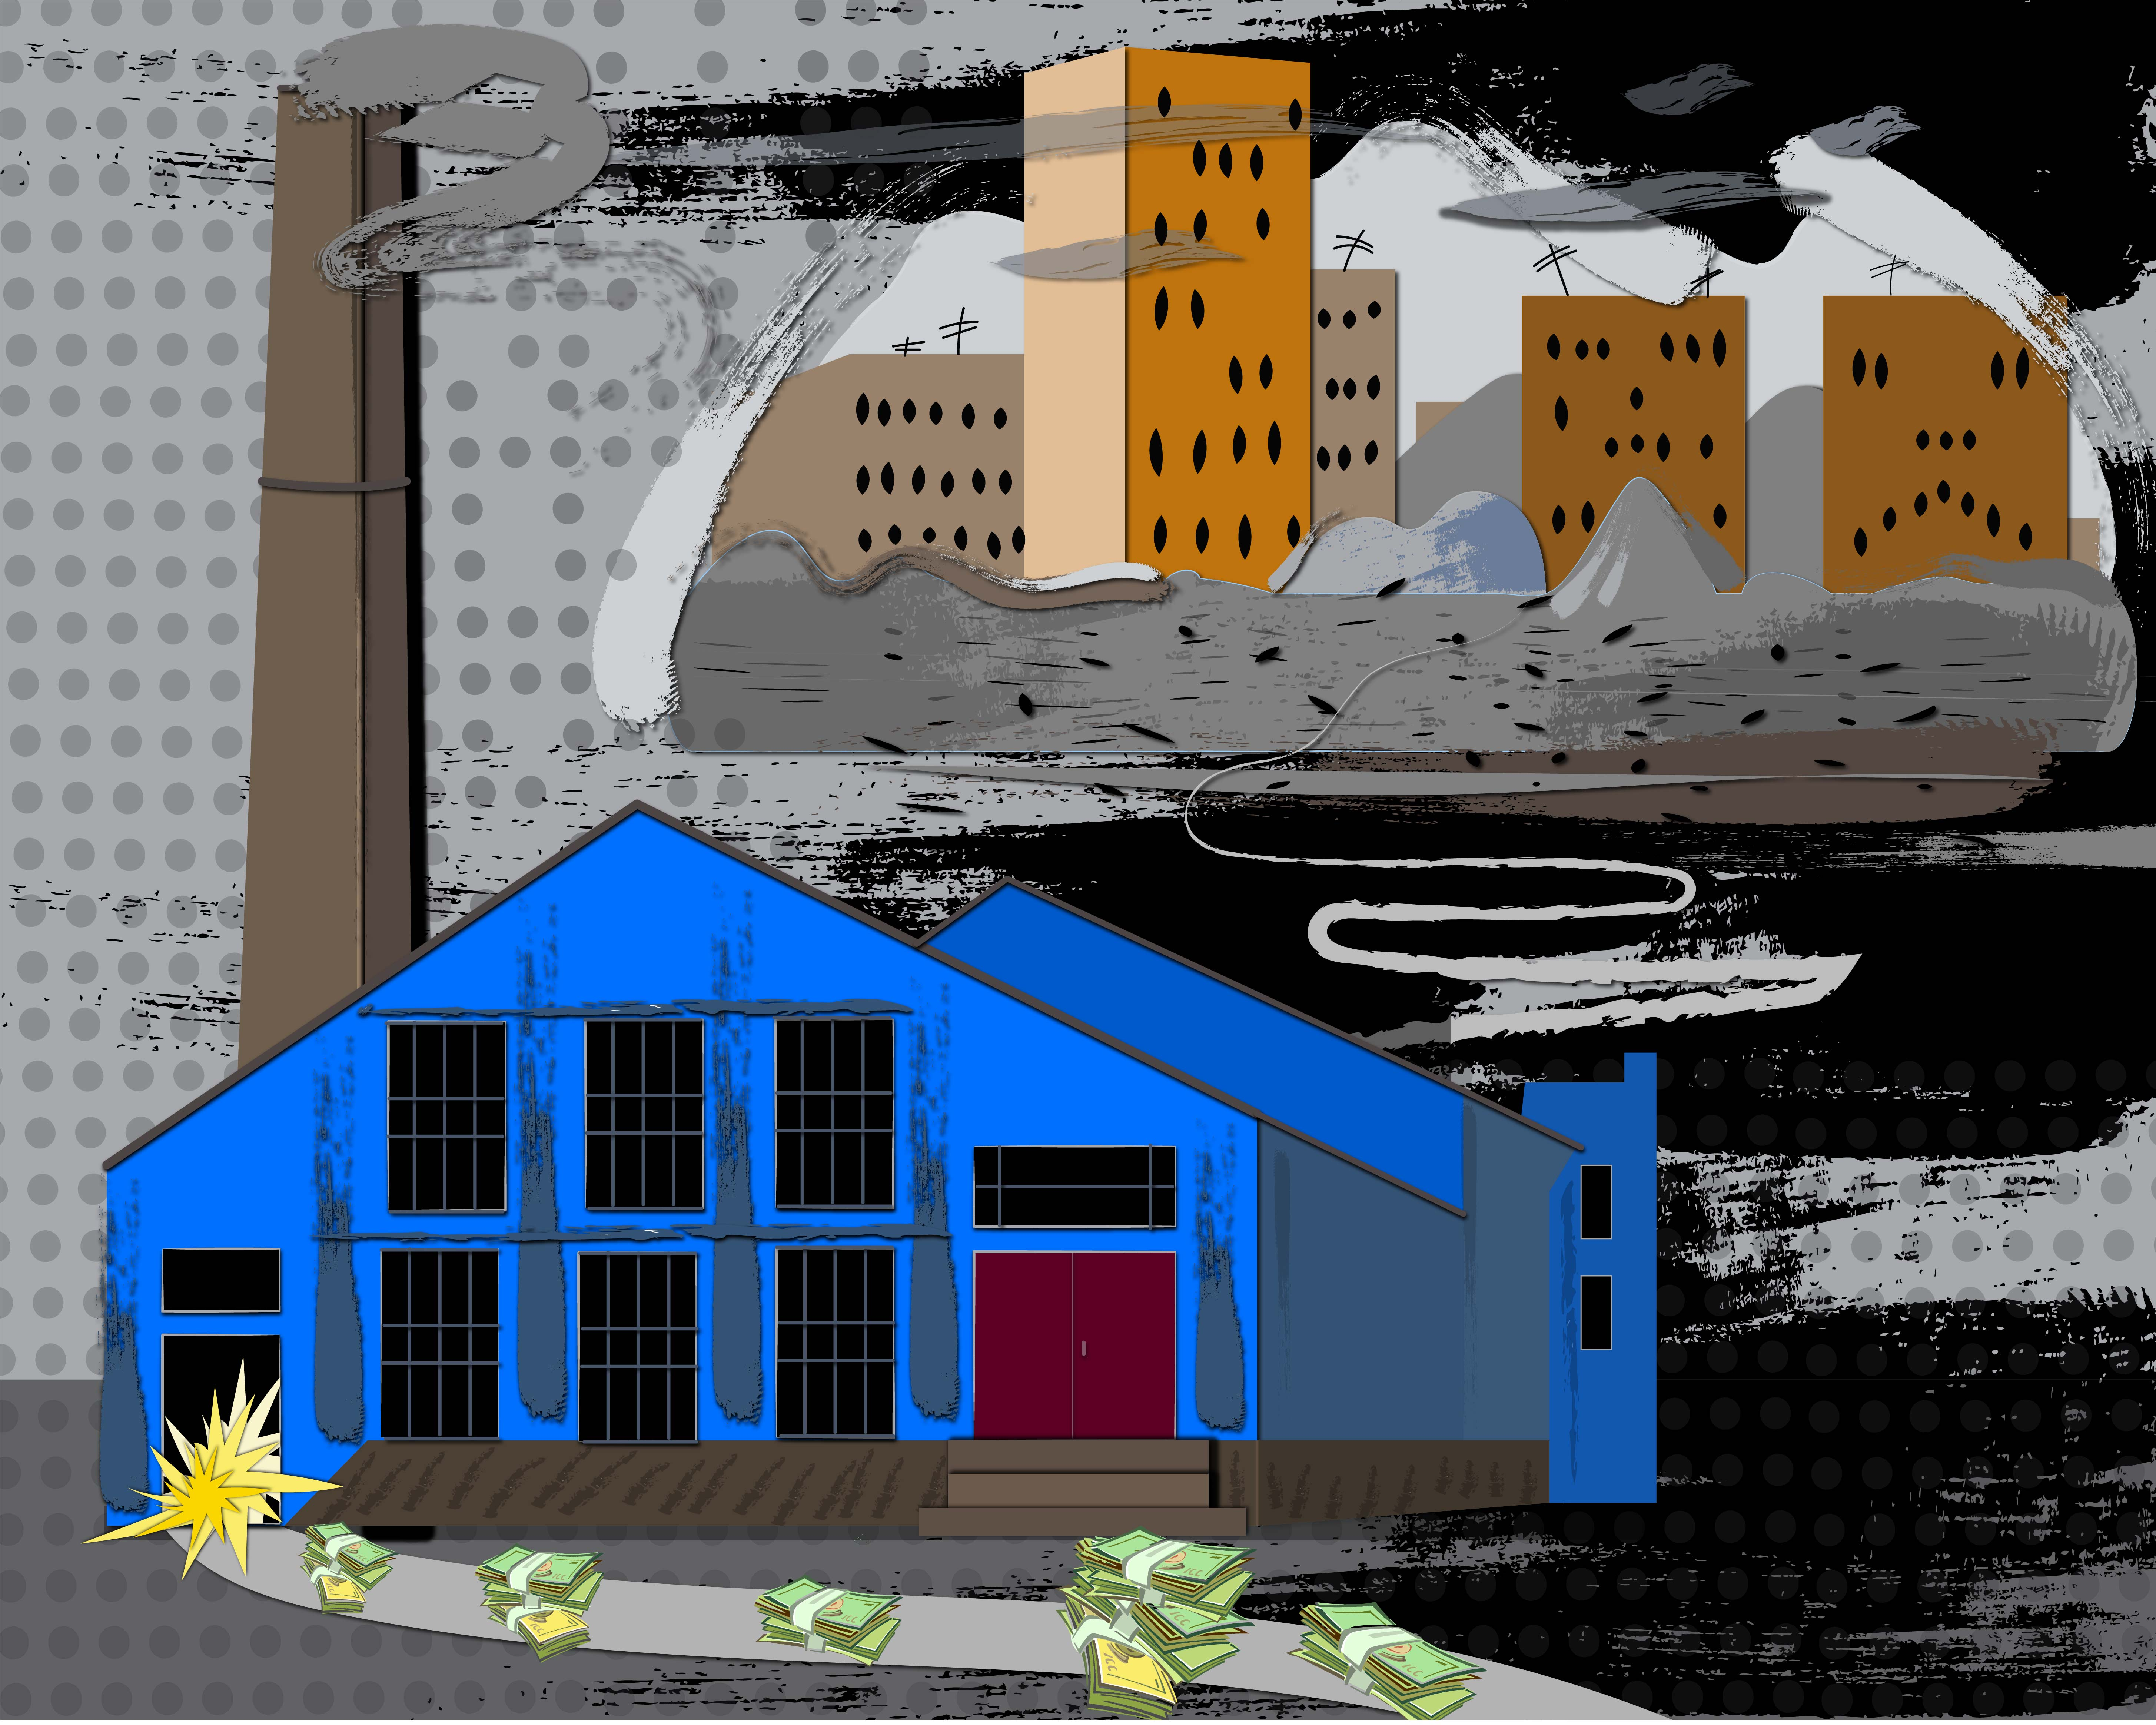 Дизайн иллюстраций блога компании ВидеоЗаяц.рф фото f_4965dd11e23b56dd.jpg